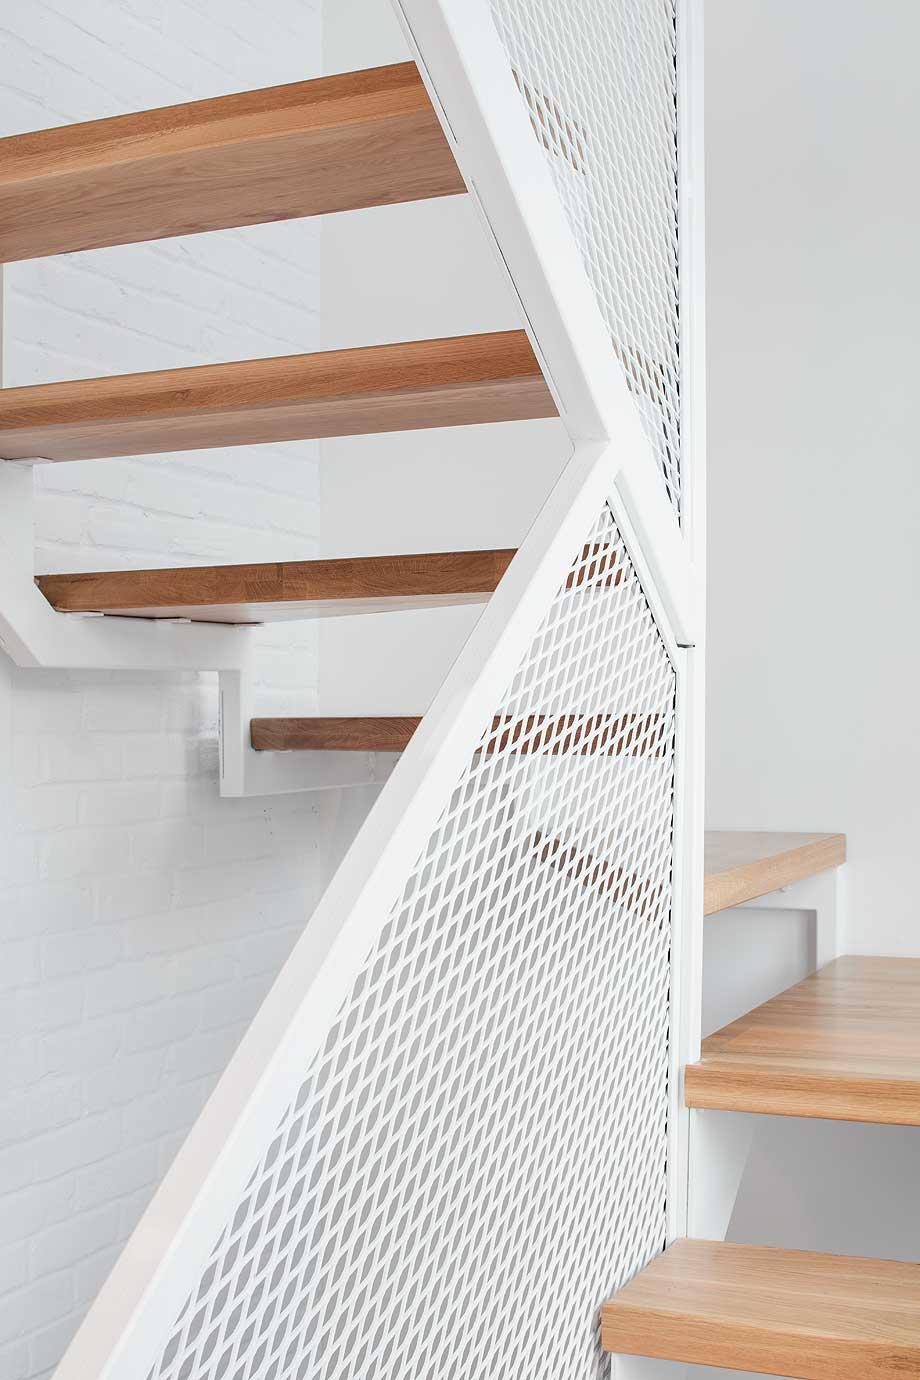 hotel-de-ville-residence-architecture-microclimat (9)